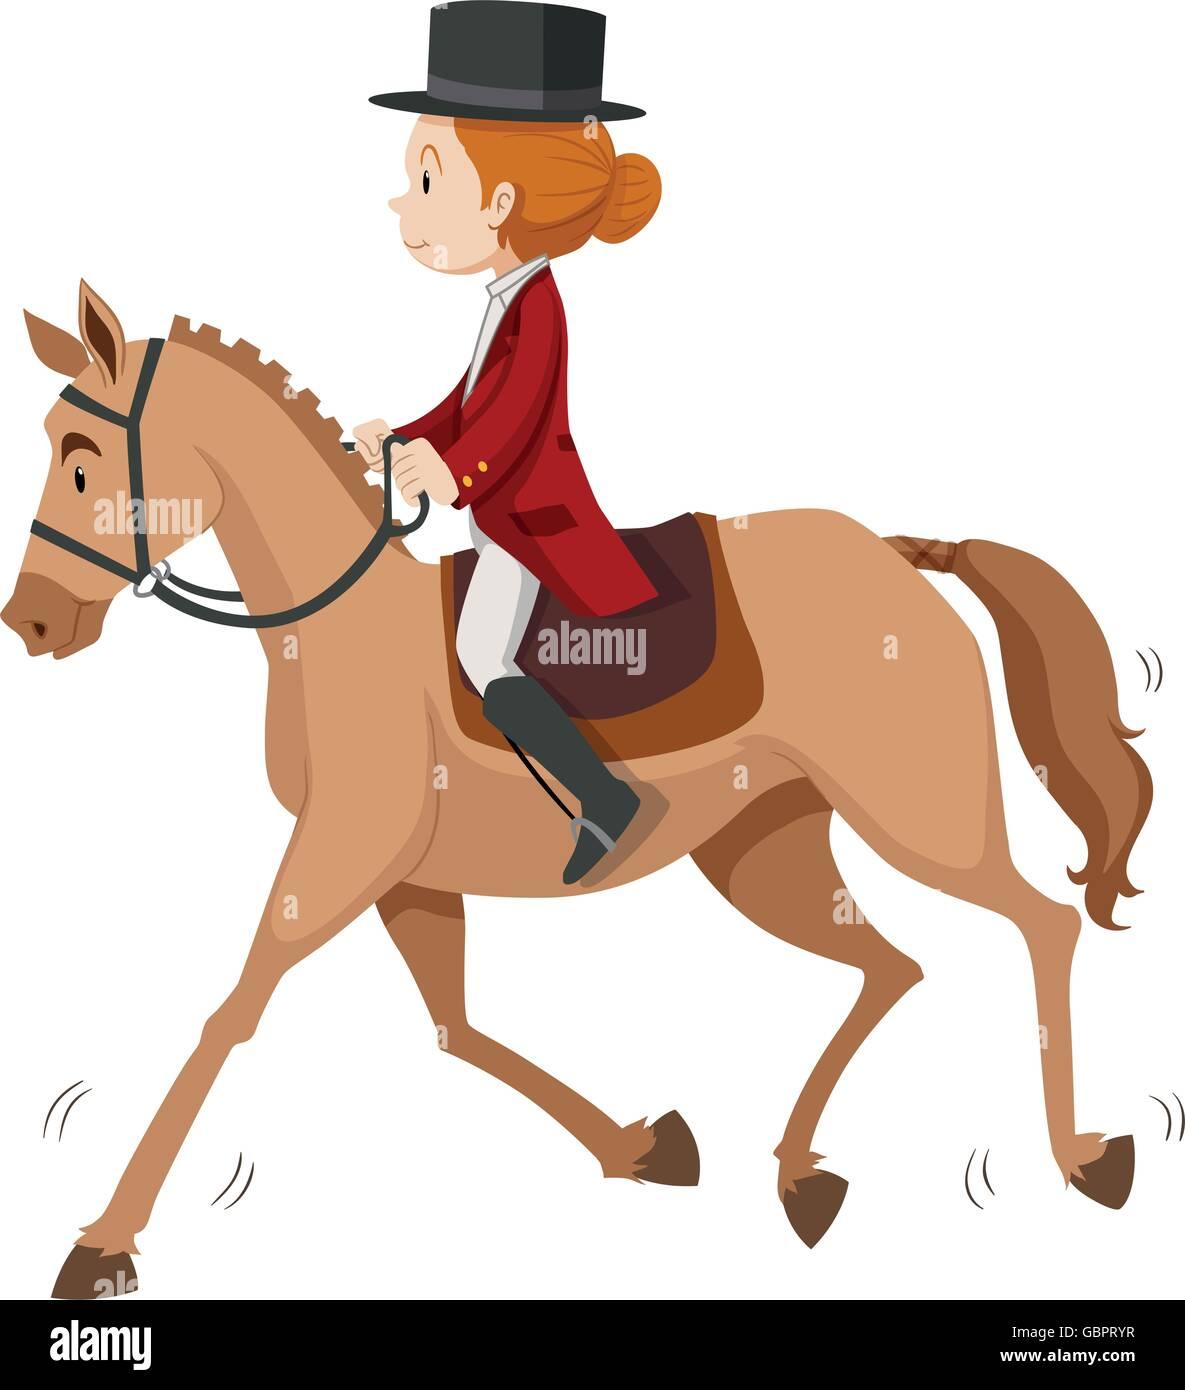 Woman Doing Horseback Riding Illustration Stock Vector Image Art Alamy